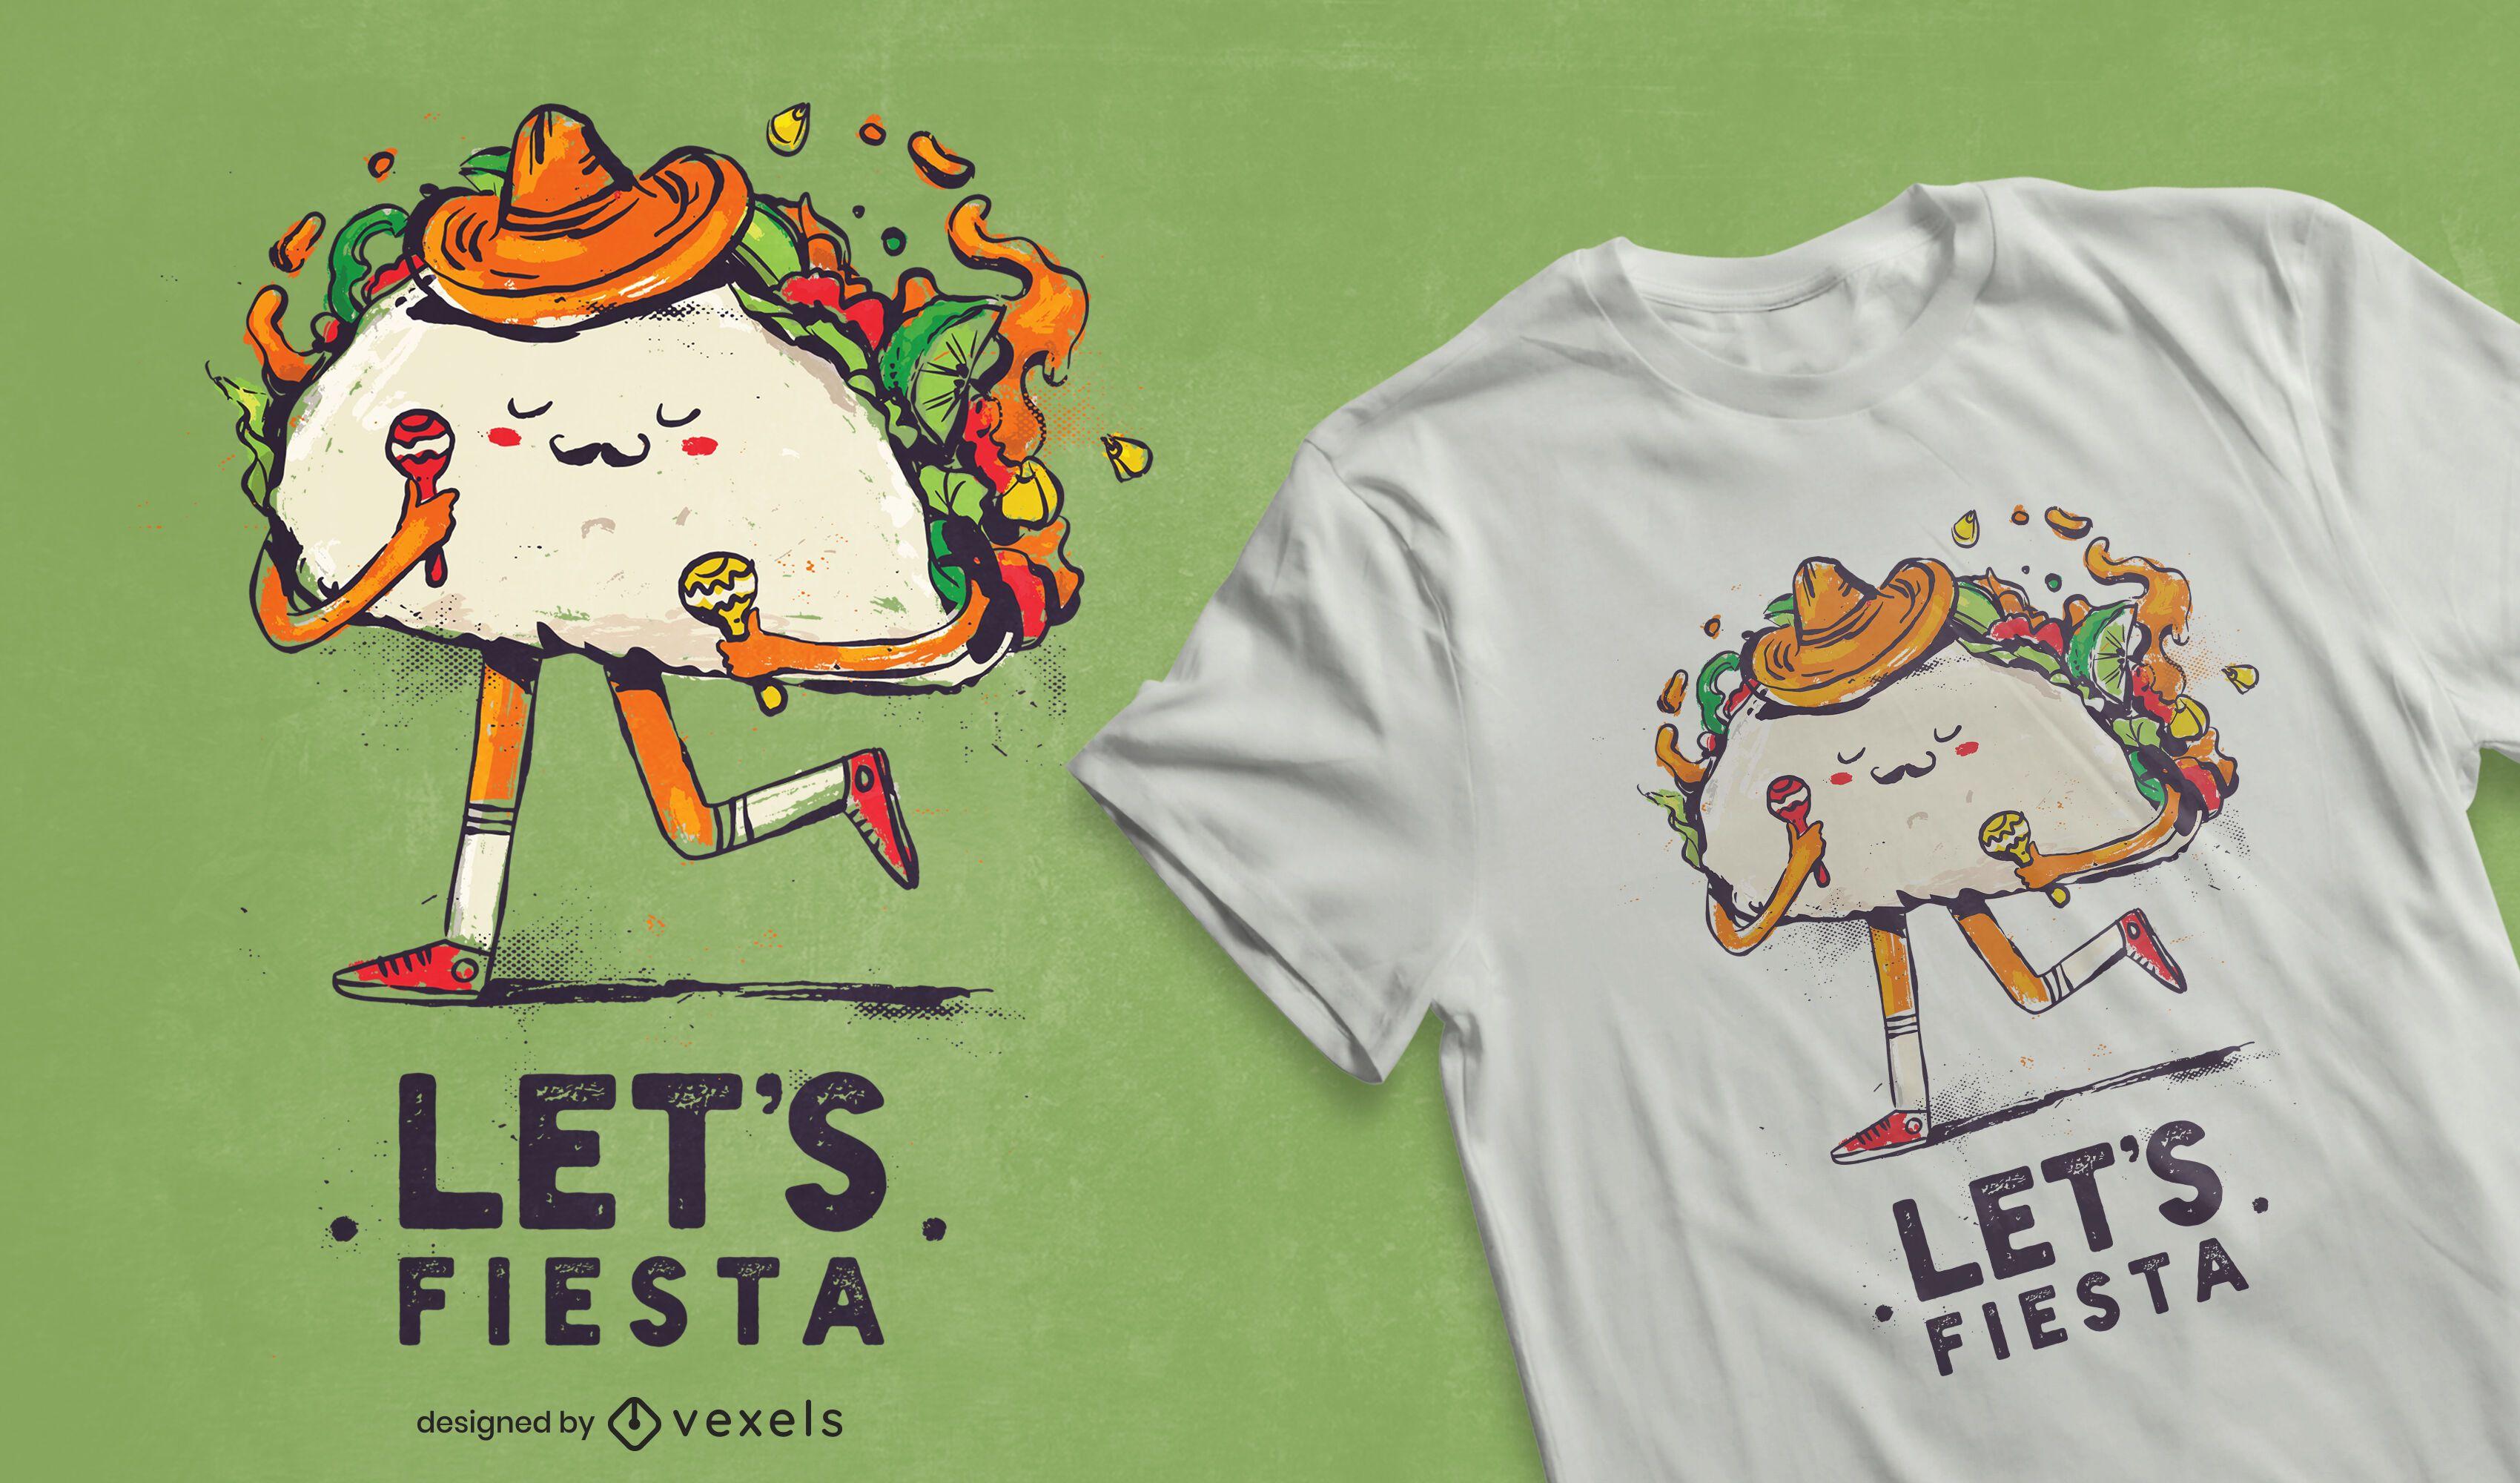 Let's fiesta t-shirt design